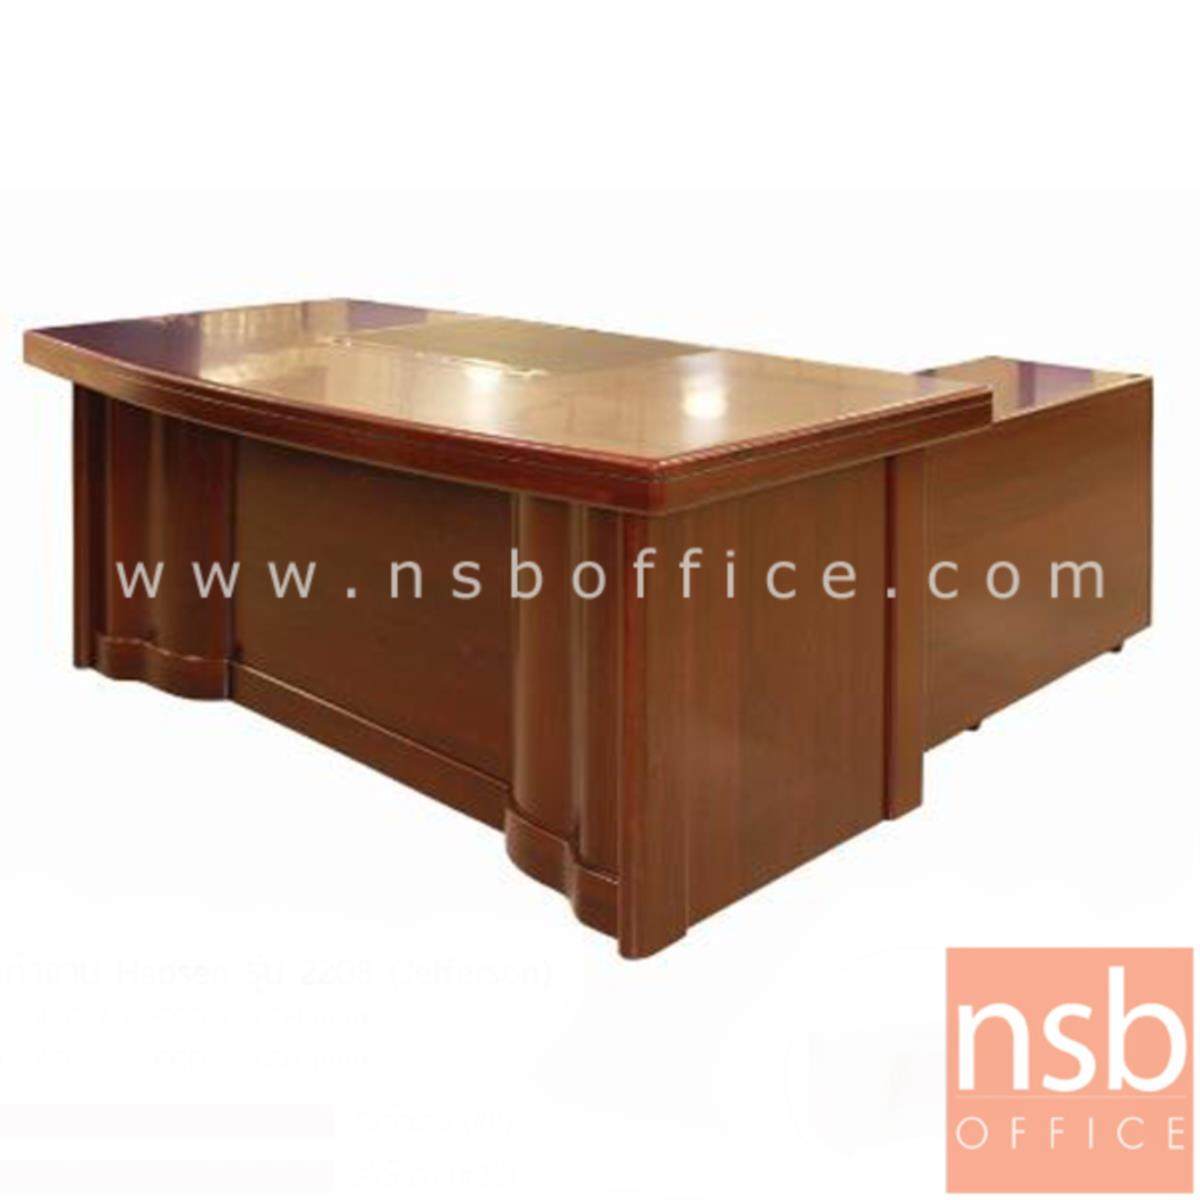 A06A061:โต๊ะผู้บริหารตัวแอล  รุ่น FELICY ขนาด 160W ,180W cm.  พร้อมโต๊ะลิ้นชักและตู้ข้าง